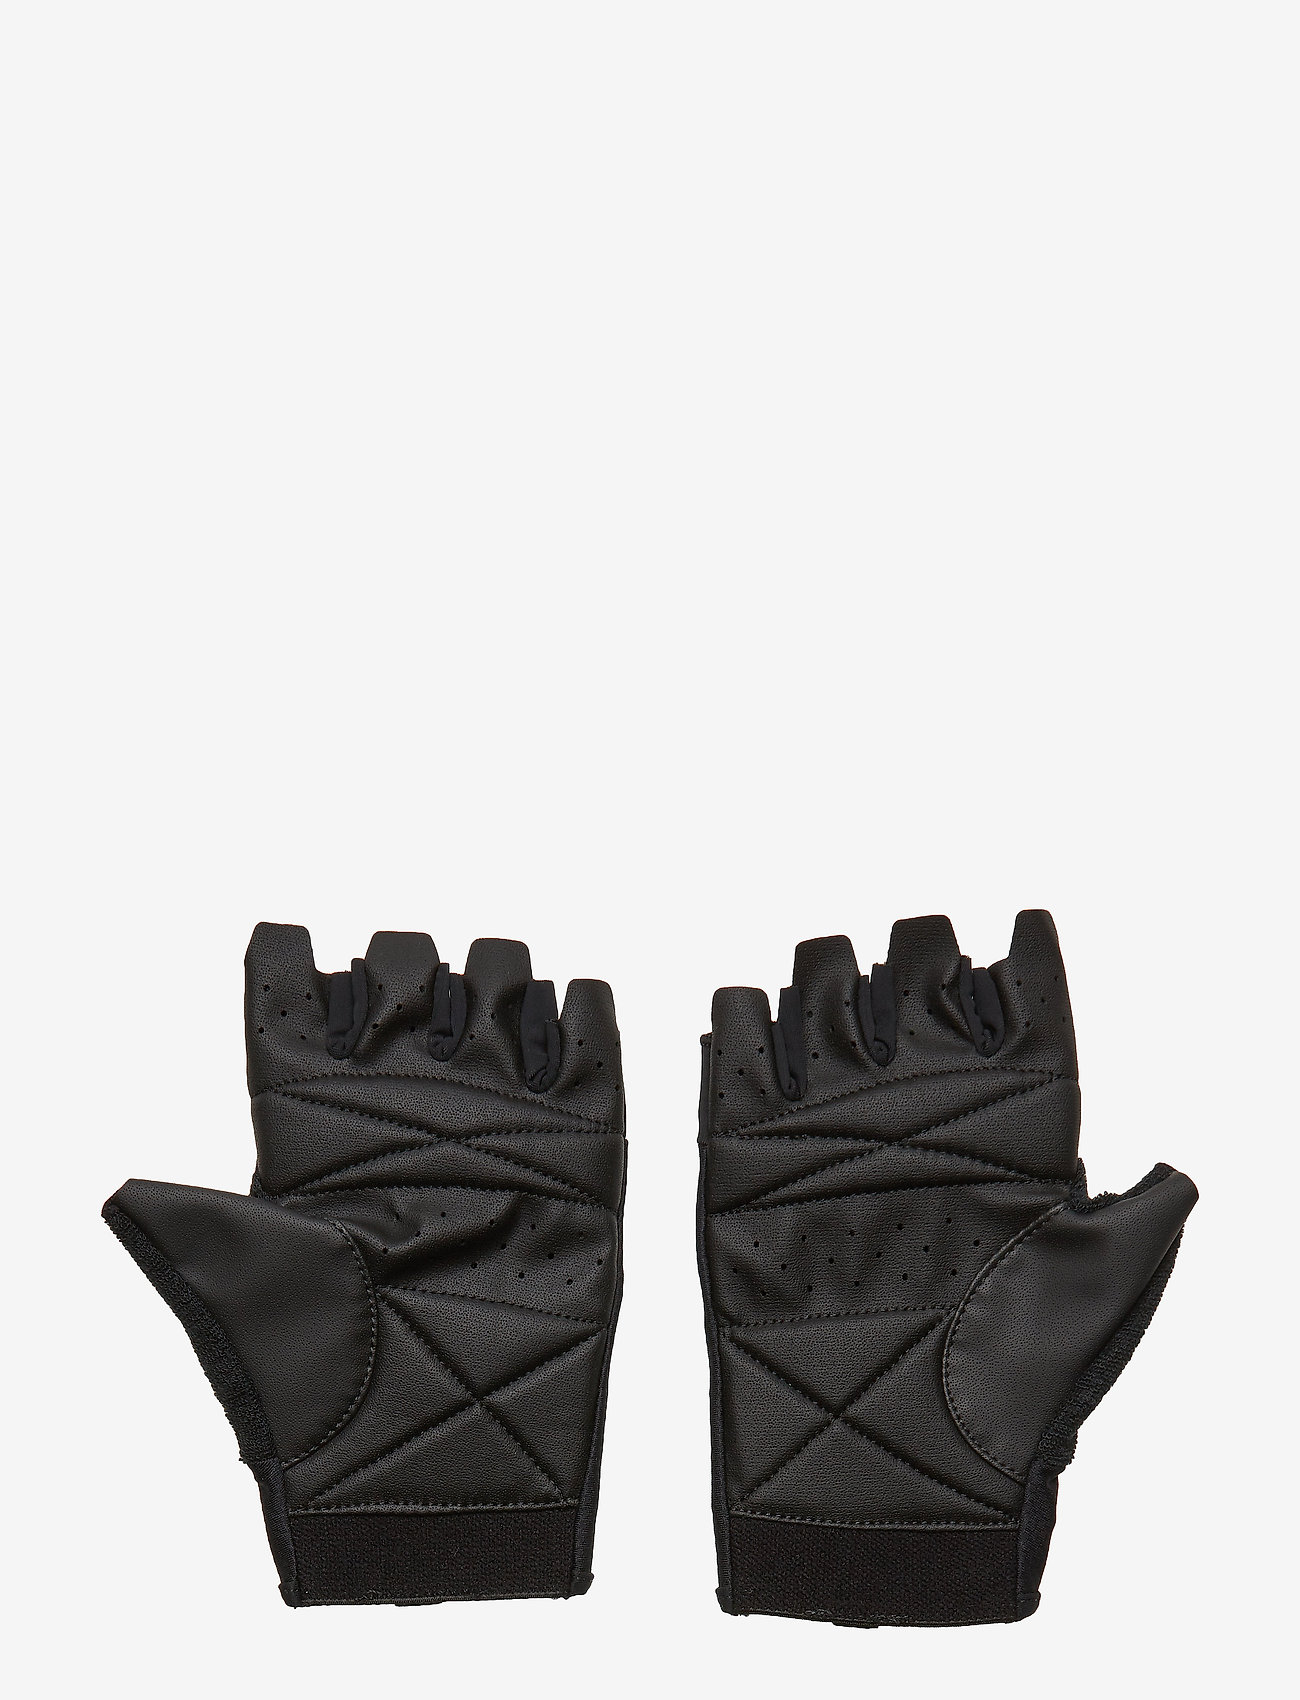 Under Armour - UA Men's Training Glove - sportutrustning - black - 0